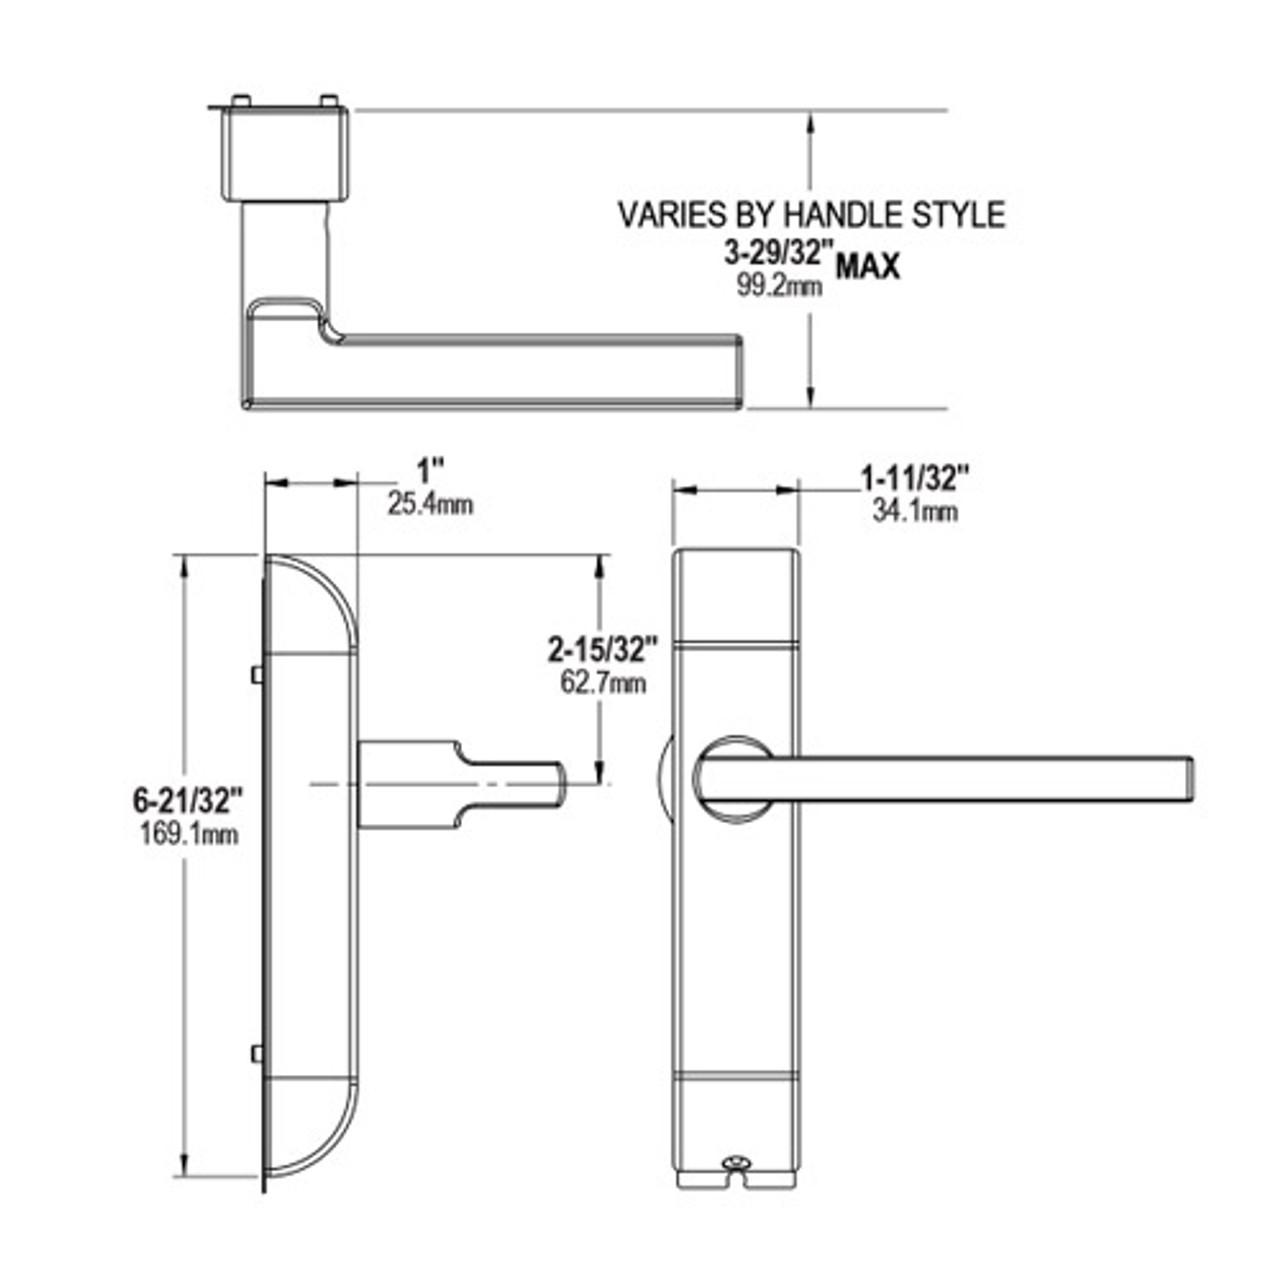 4600-MD-632-US32 Adams Rite MD Designer handle Dimensional View